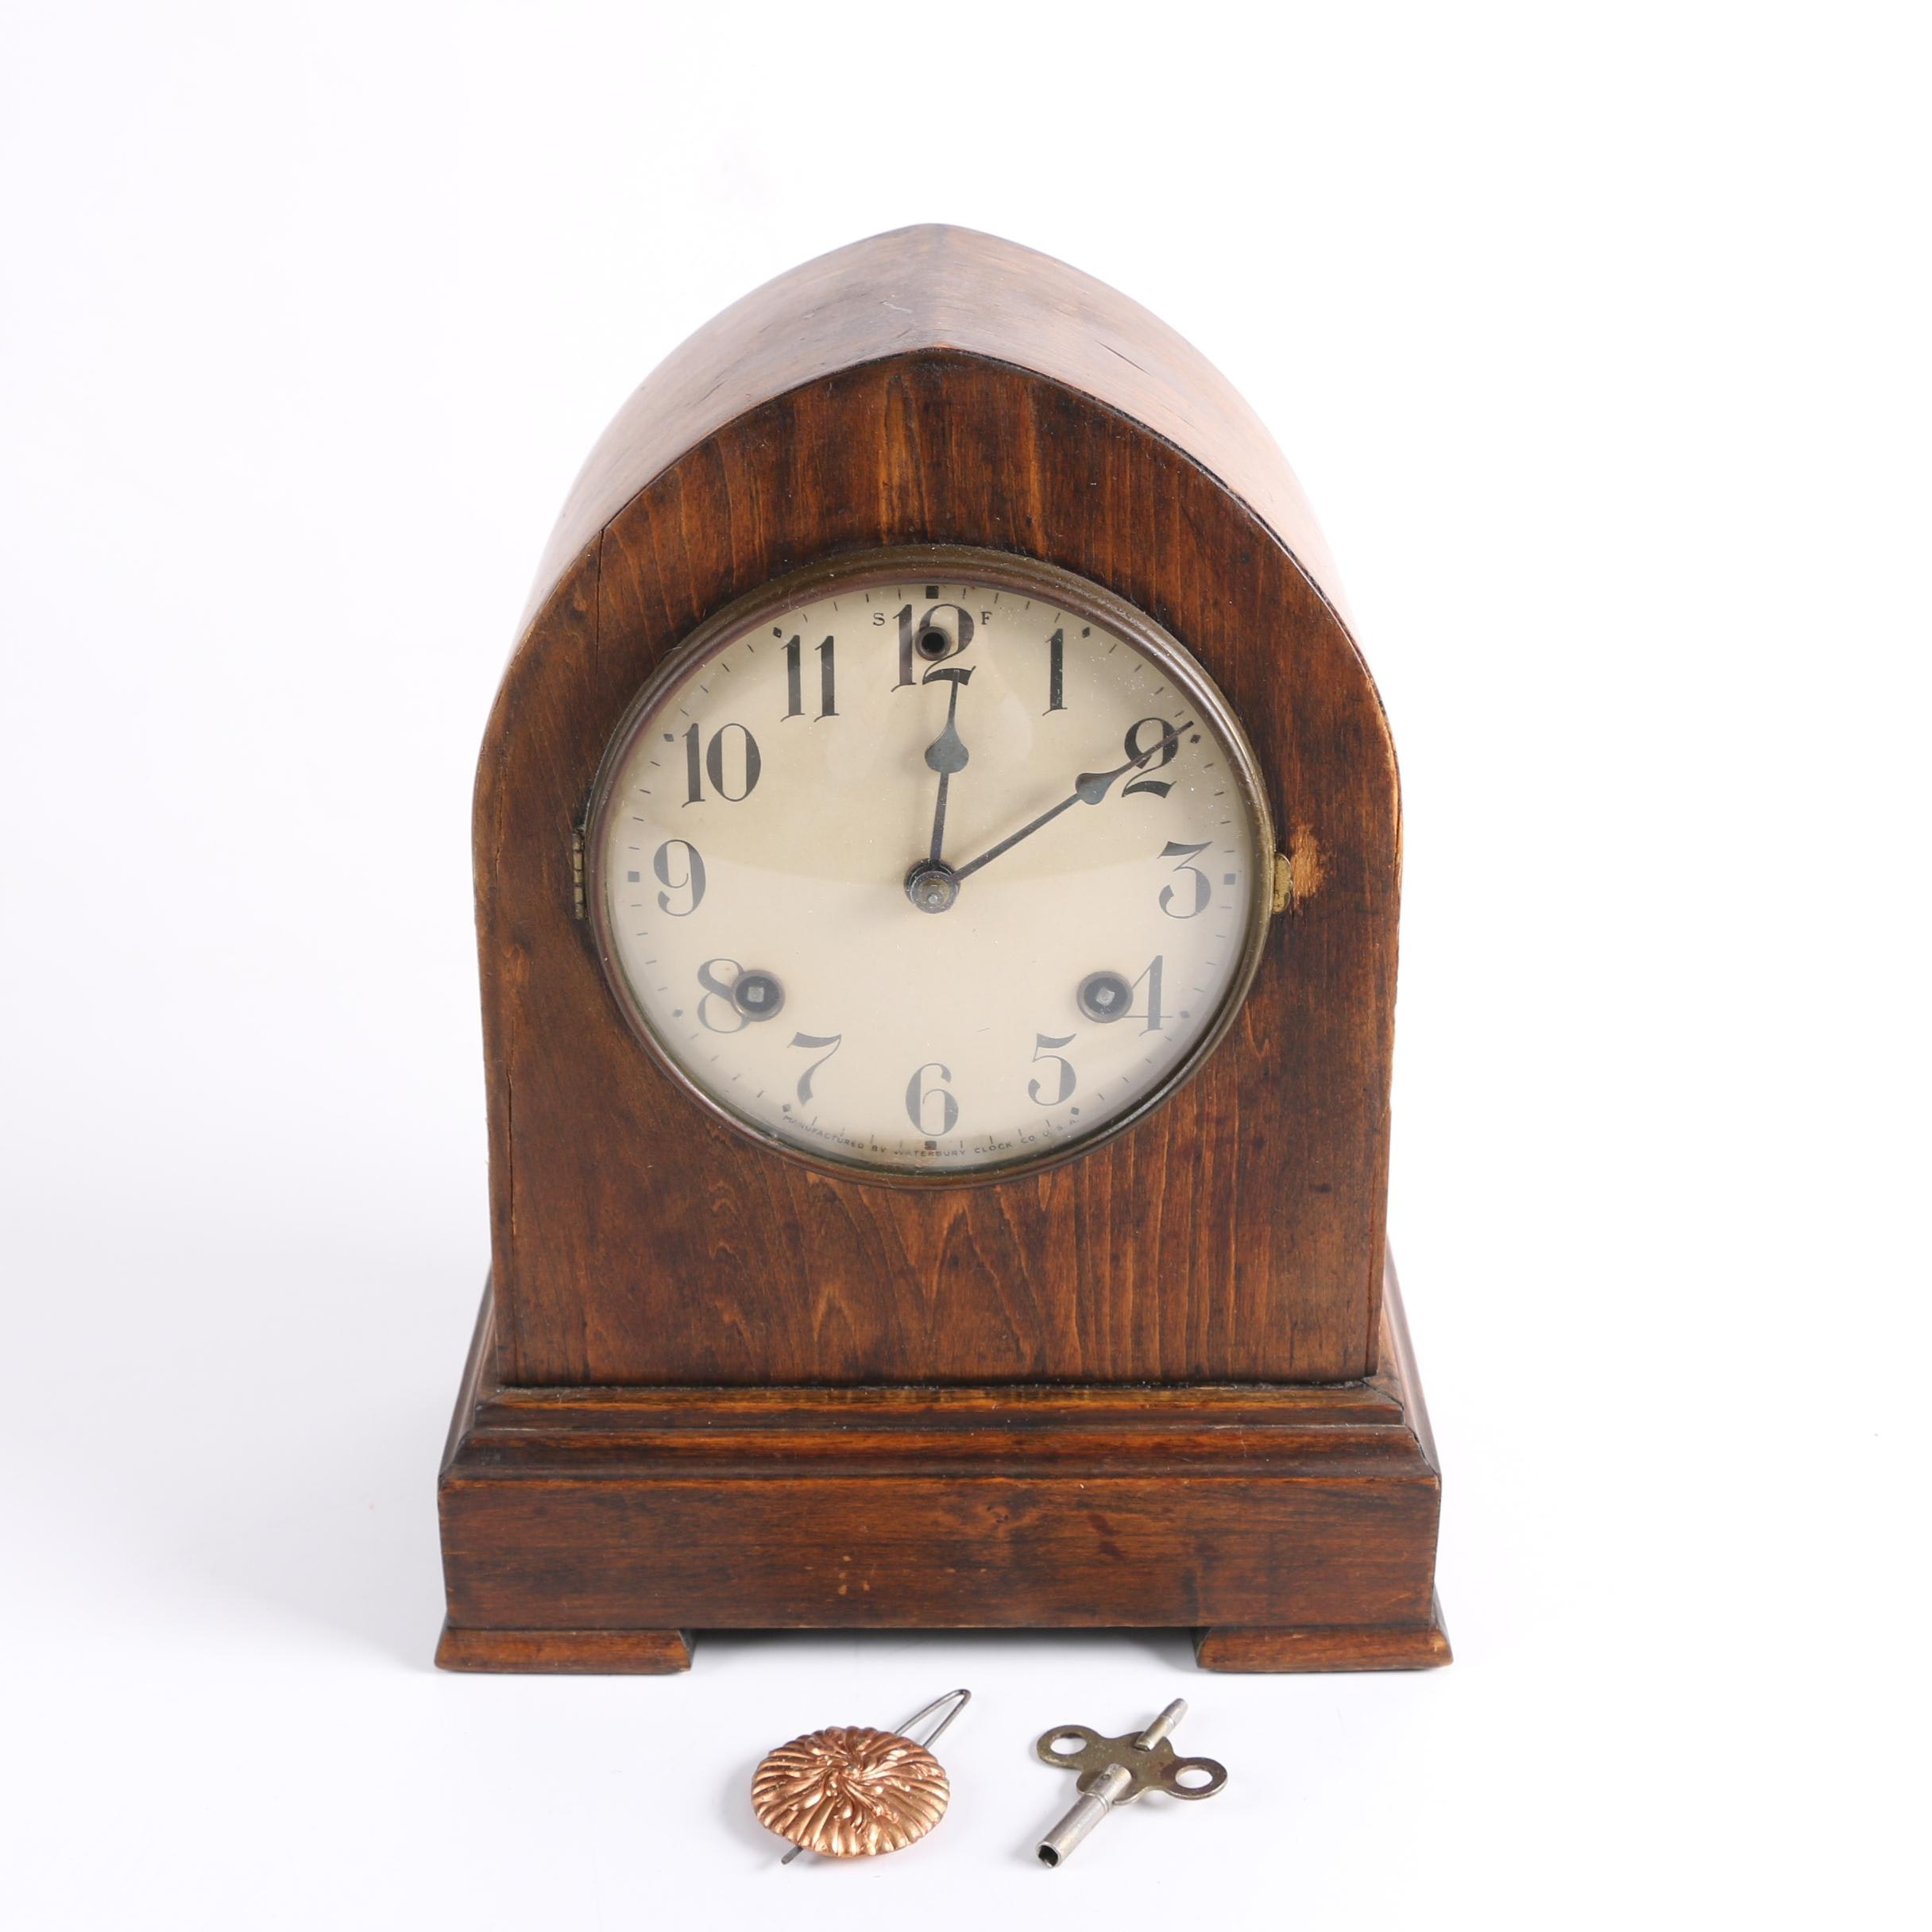 Early 20th Century Waterbury Clock Co. Mantel Clock